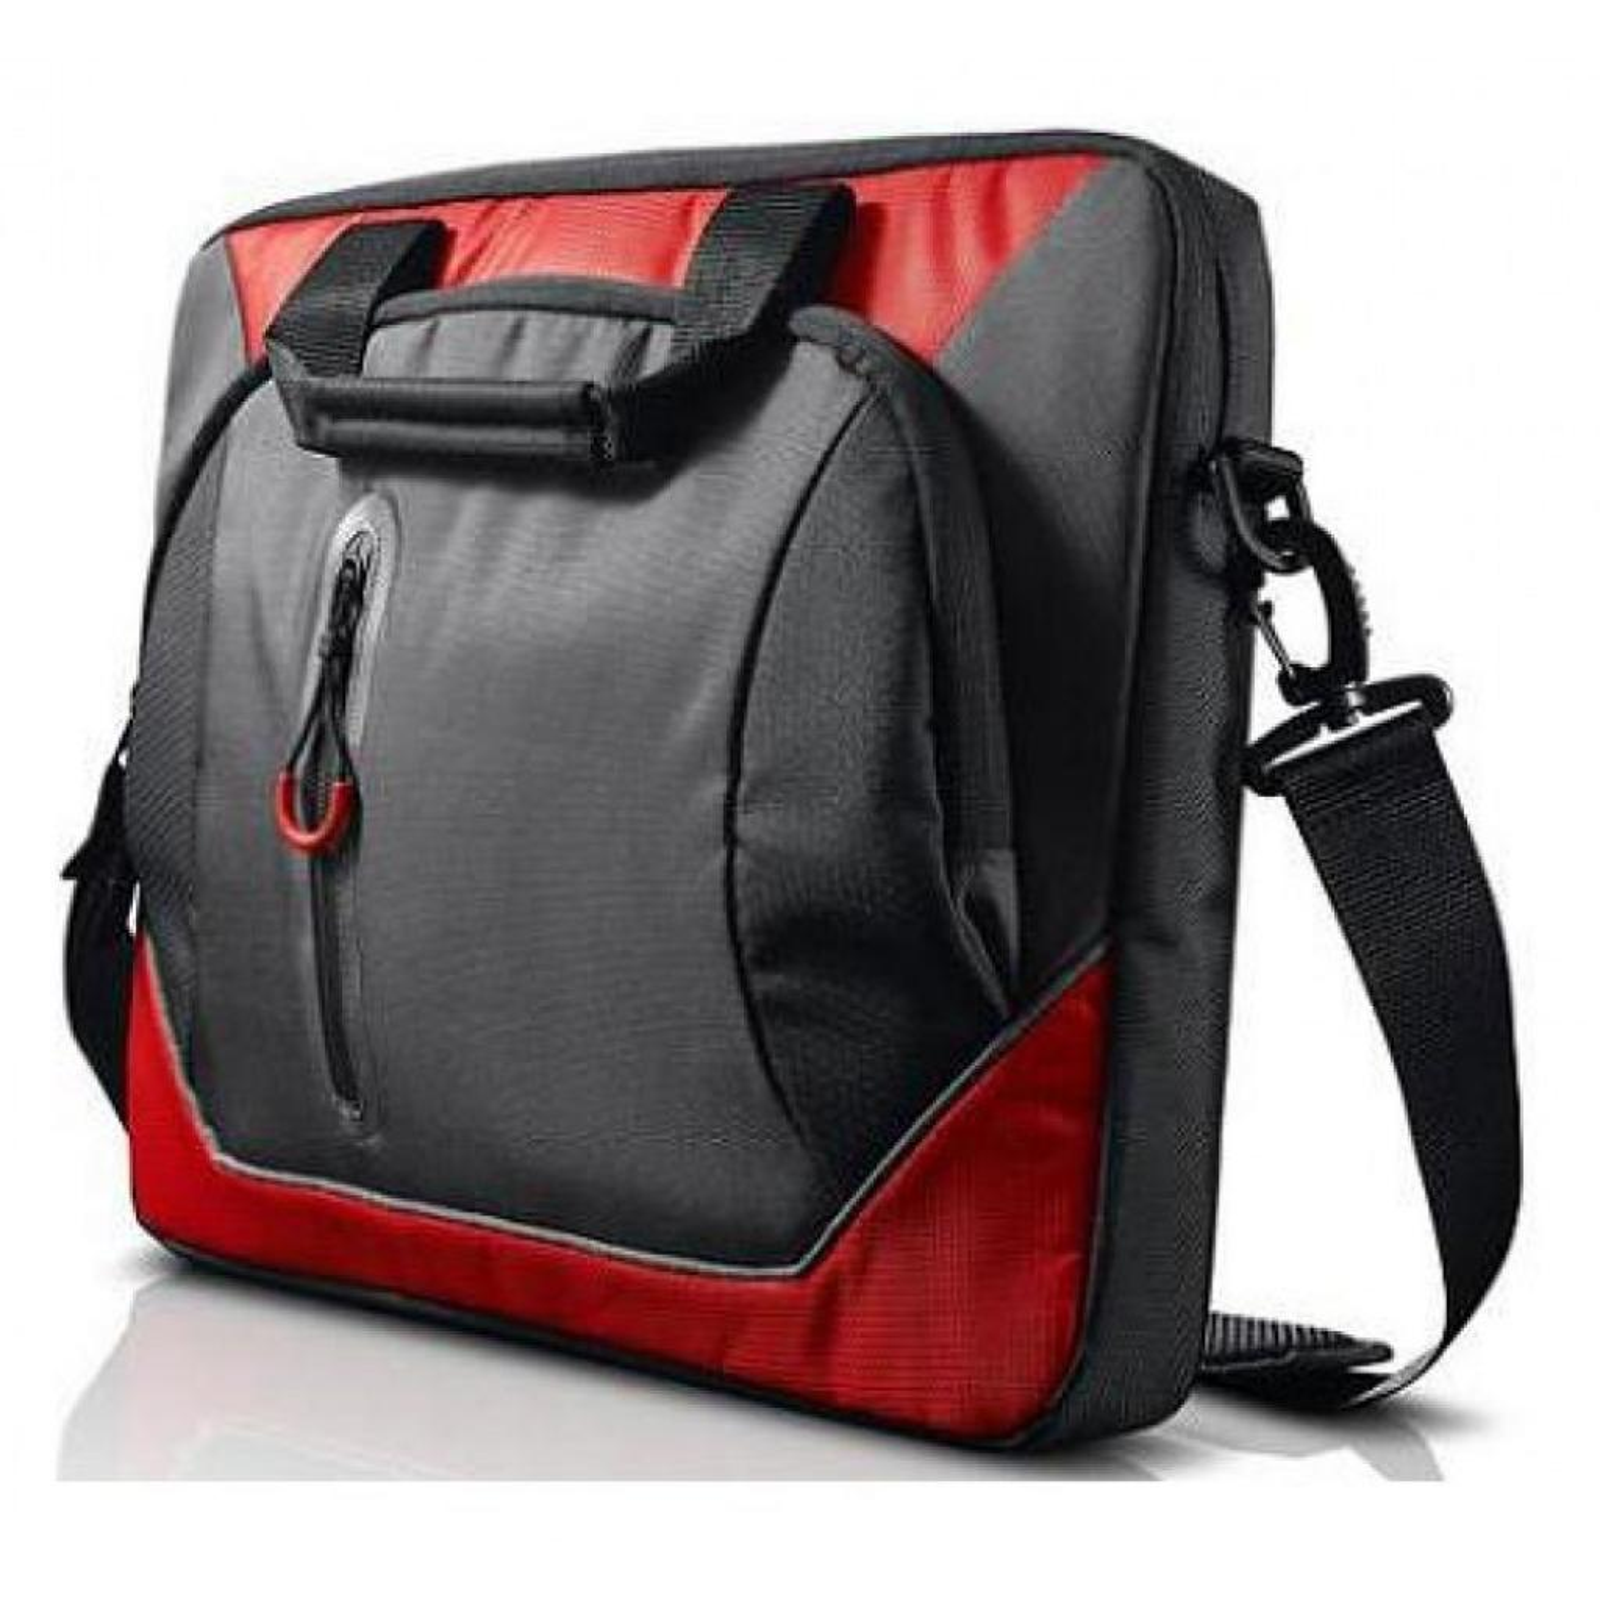 Сумка для ноутбука Lenovo 15.6 Sport Slimcase Red (0A33897)